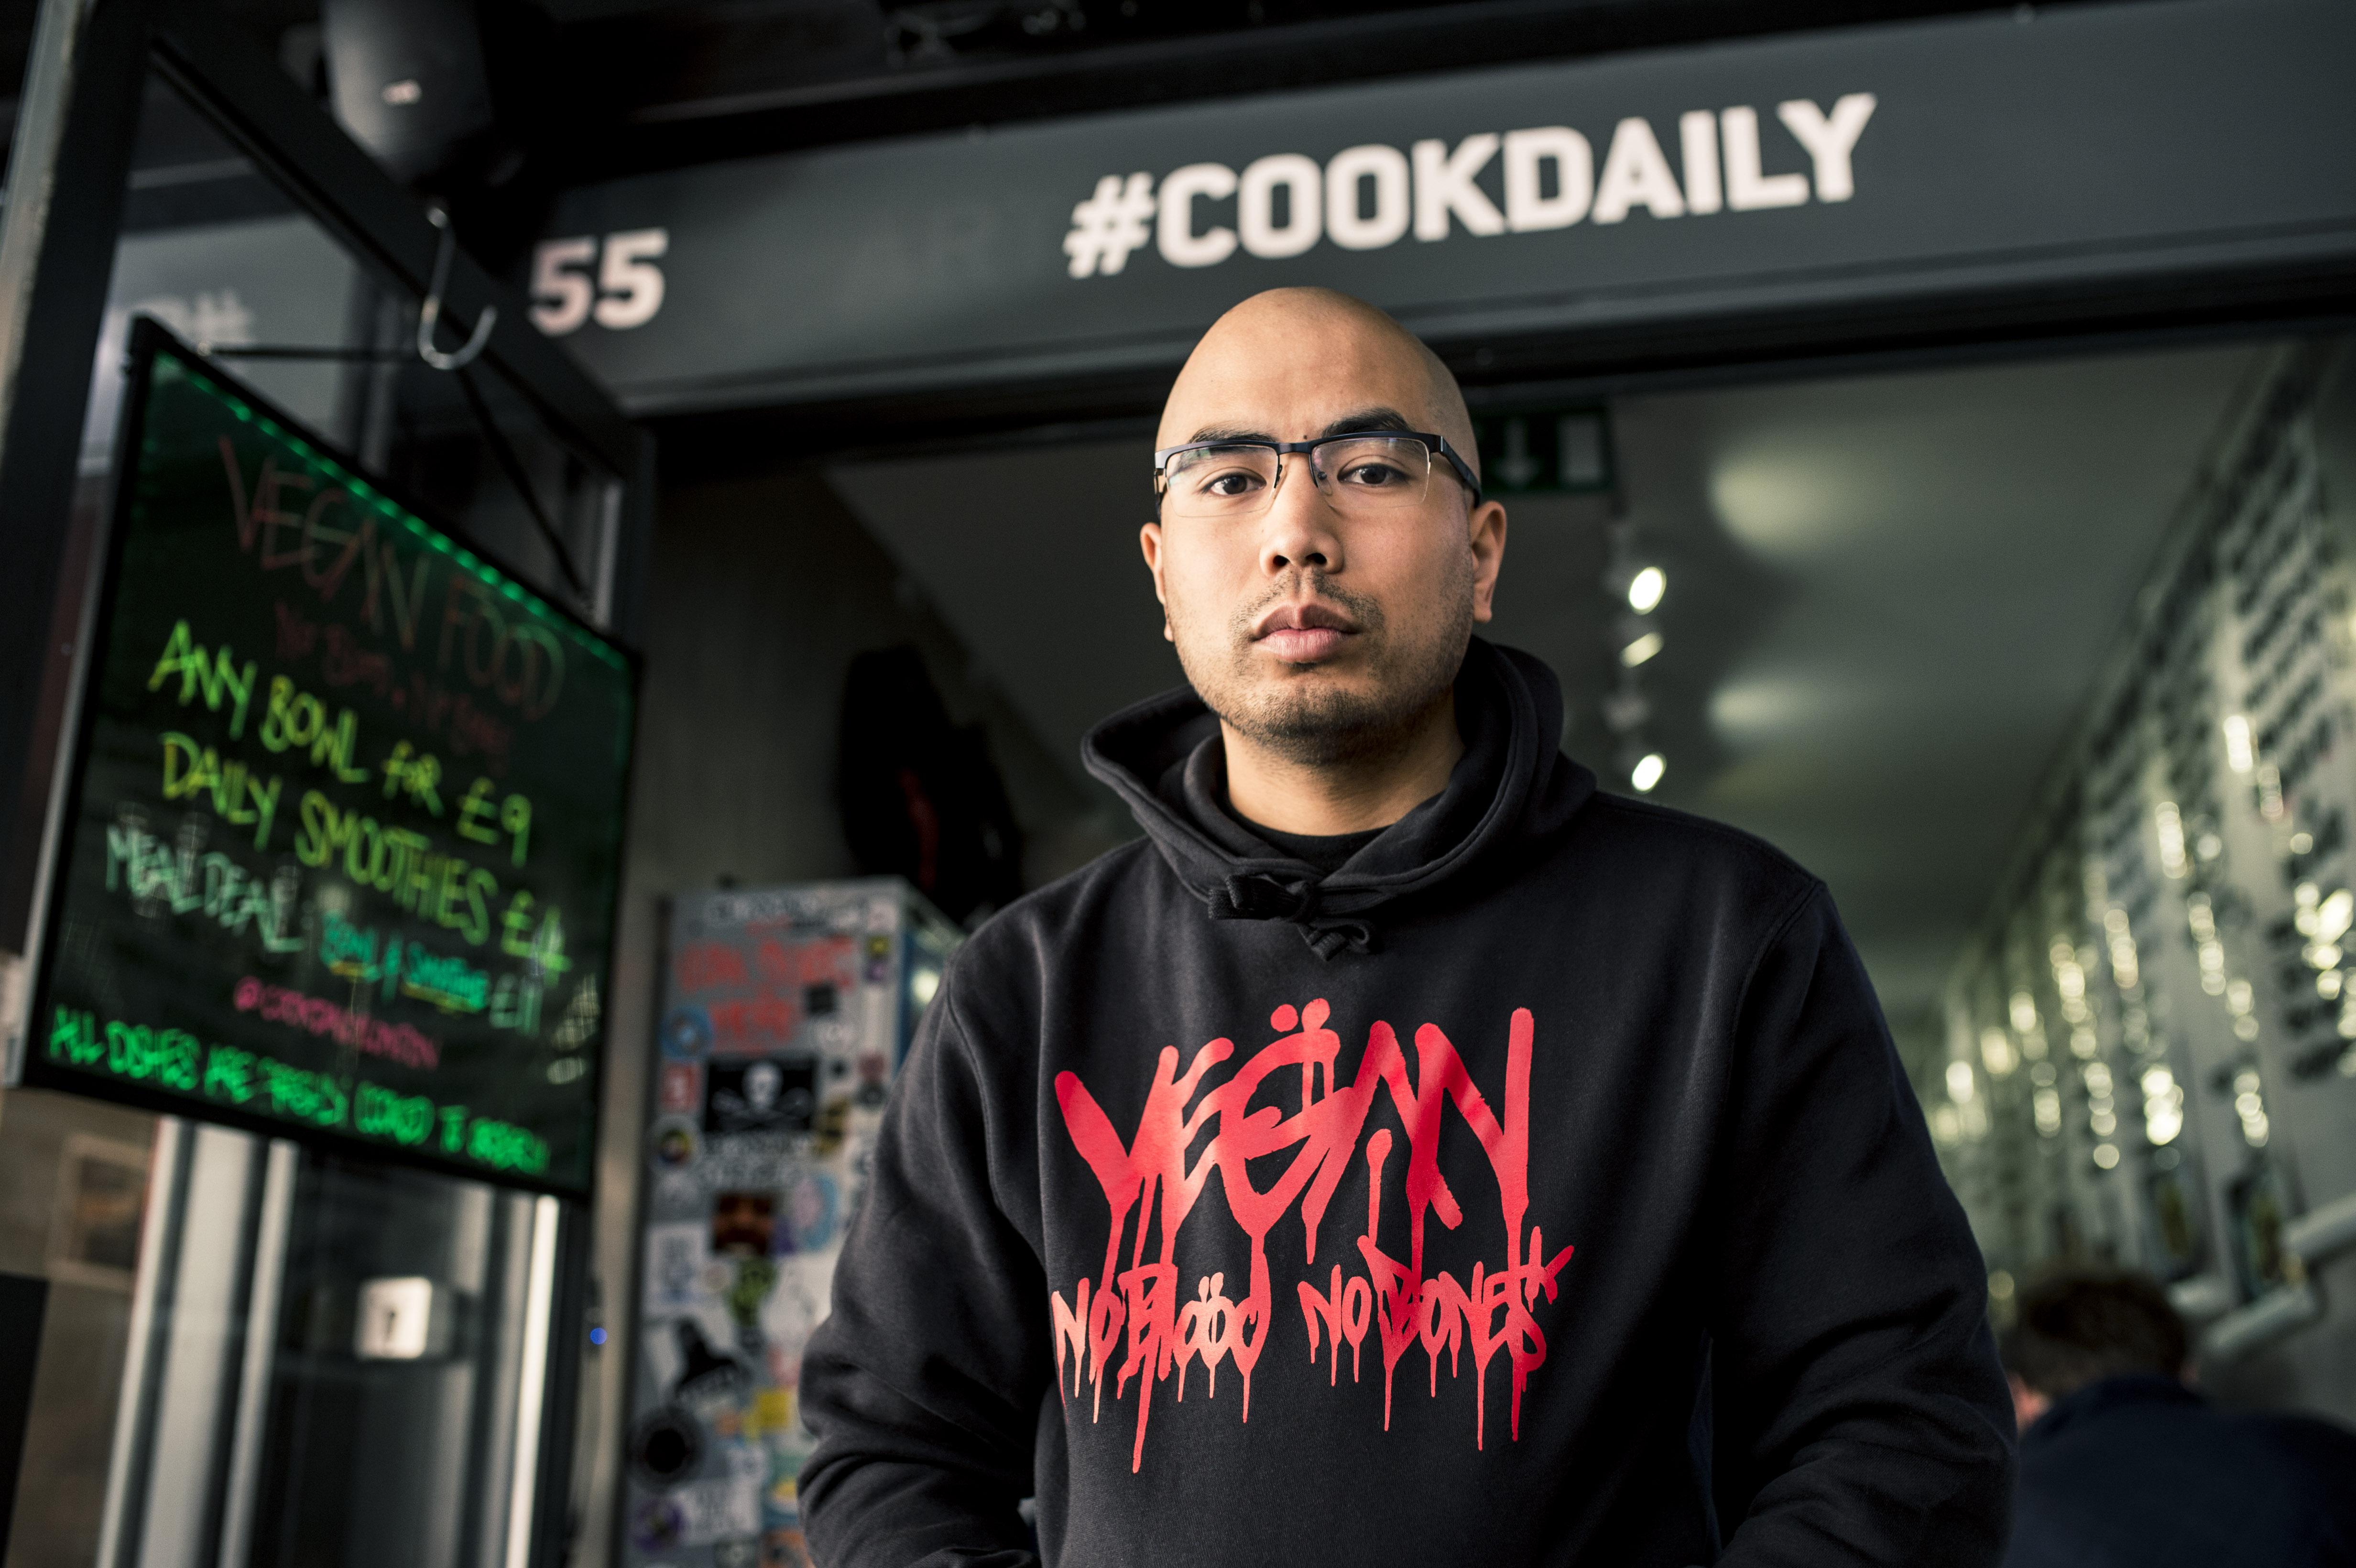 London vegan restaurant Cook Daily